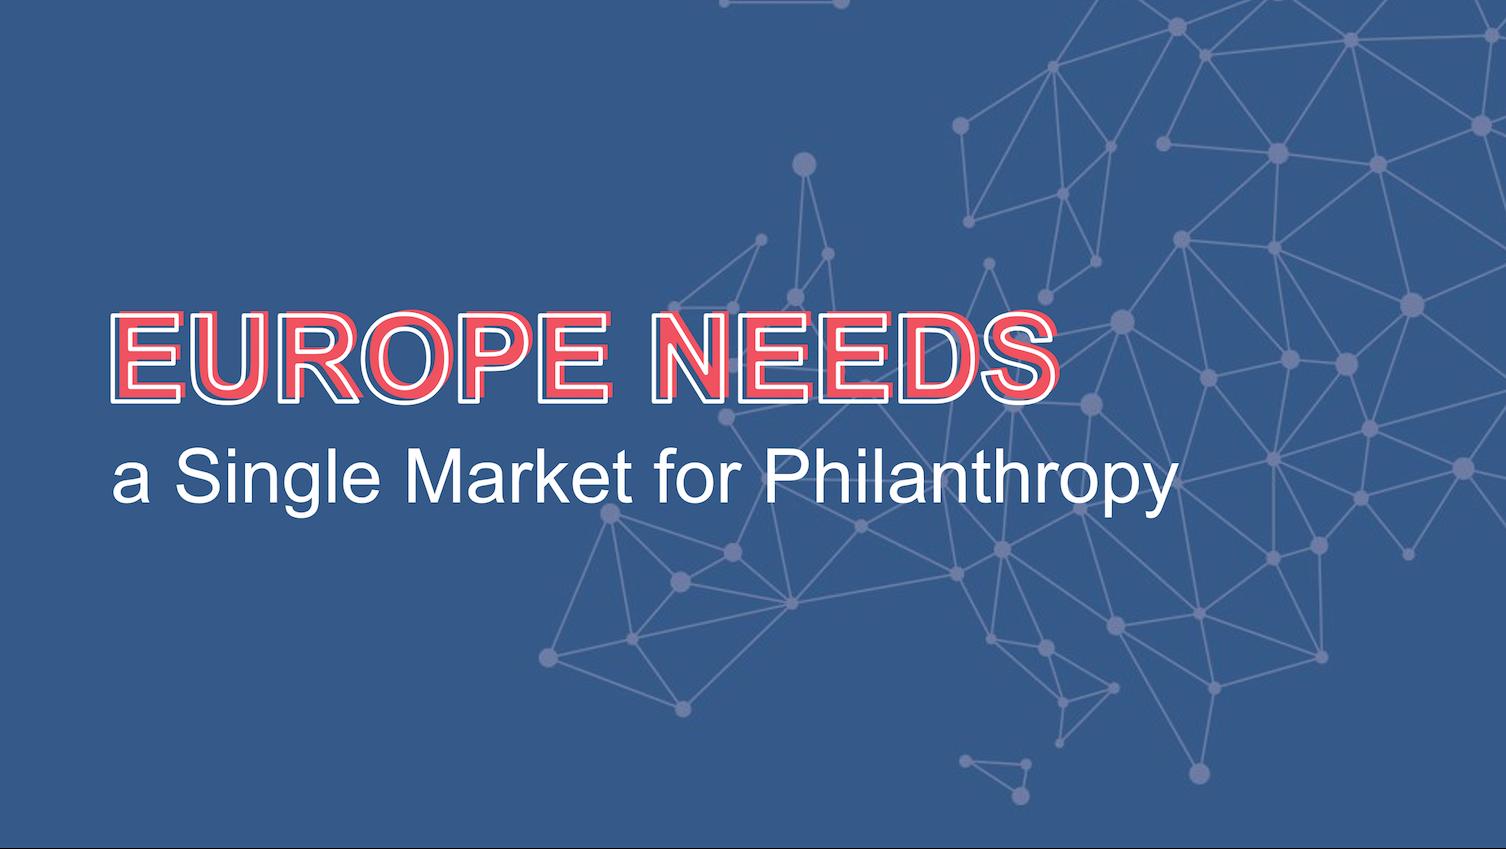 Single Market for Philanthropy